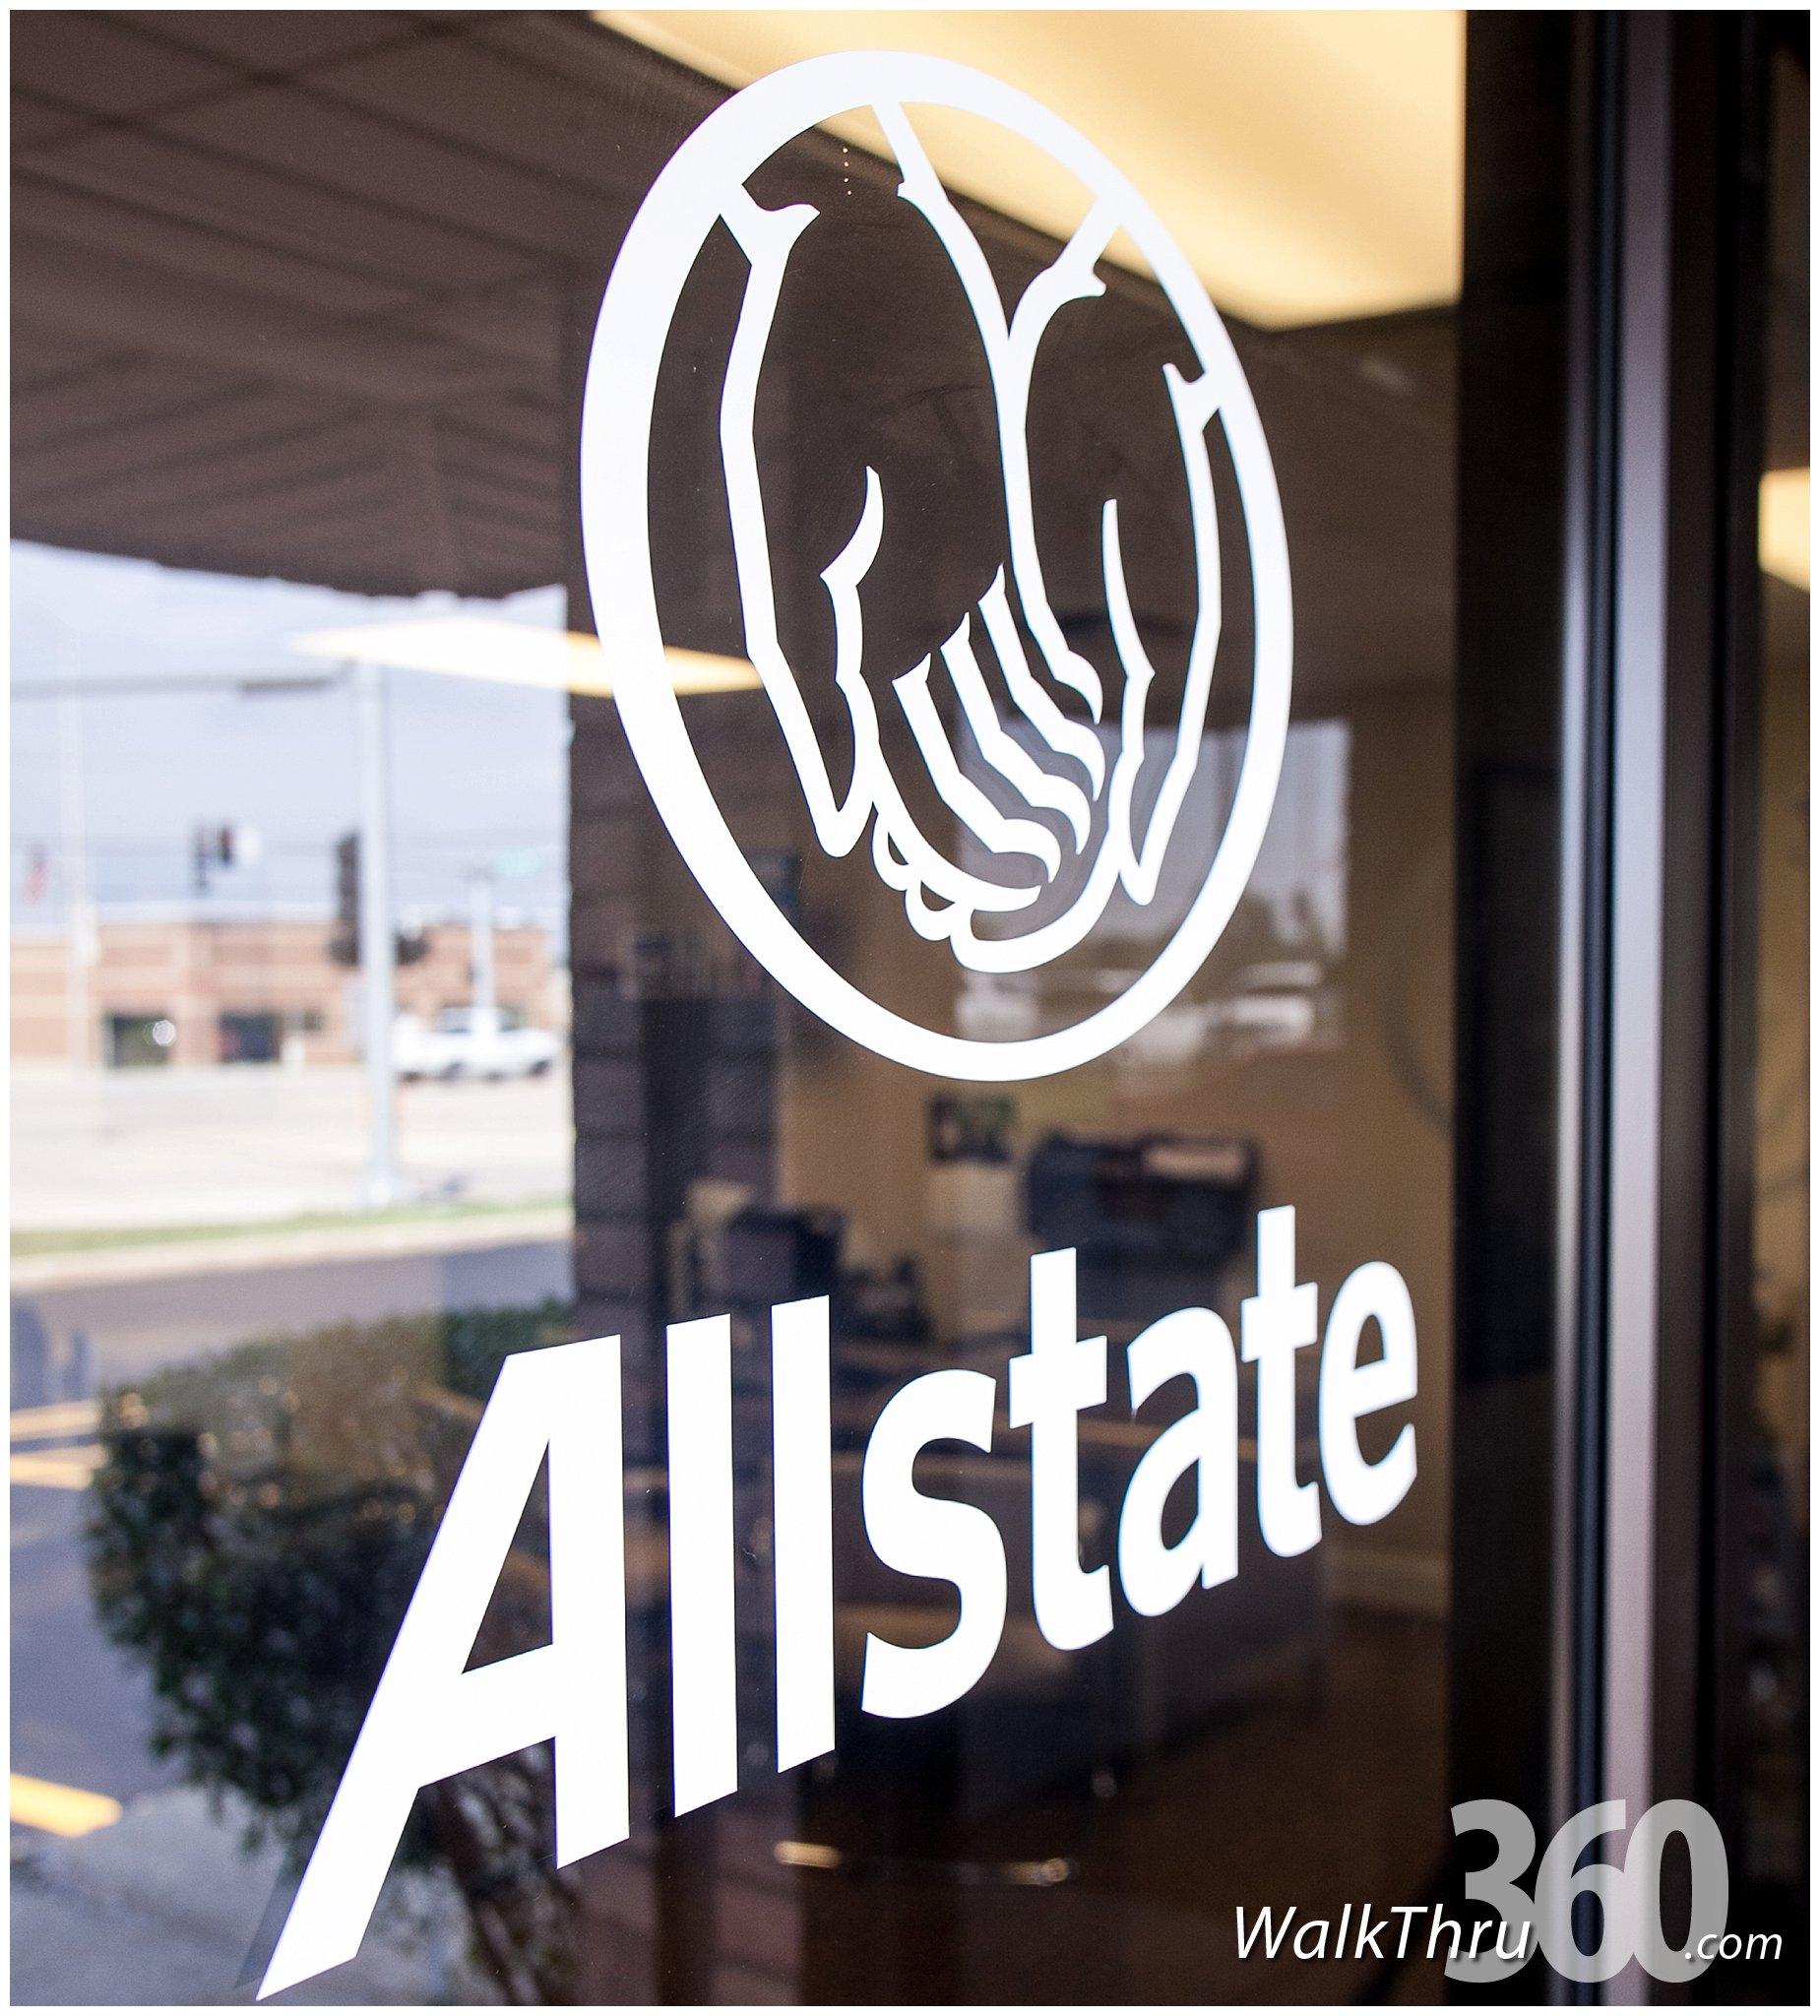 Allstate Quote Online Dean De Angelis  Allstate Insurance Street Viewwalkthru360